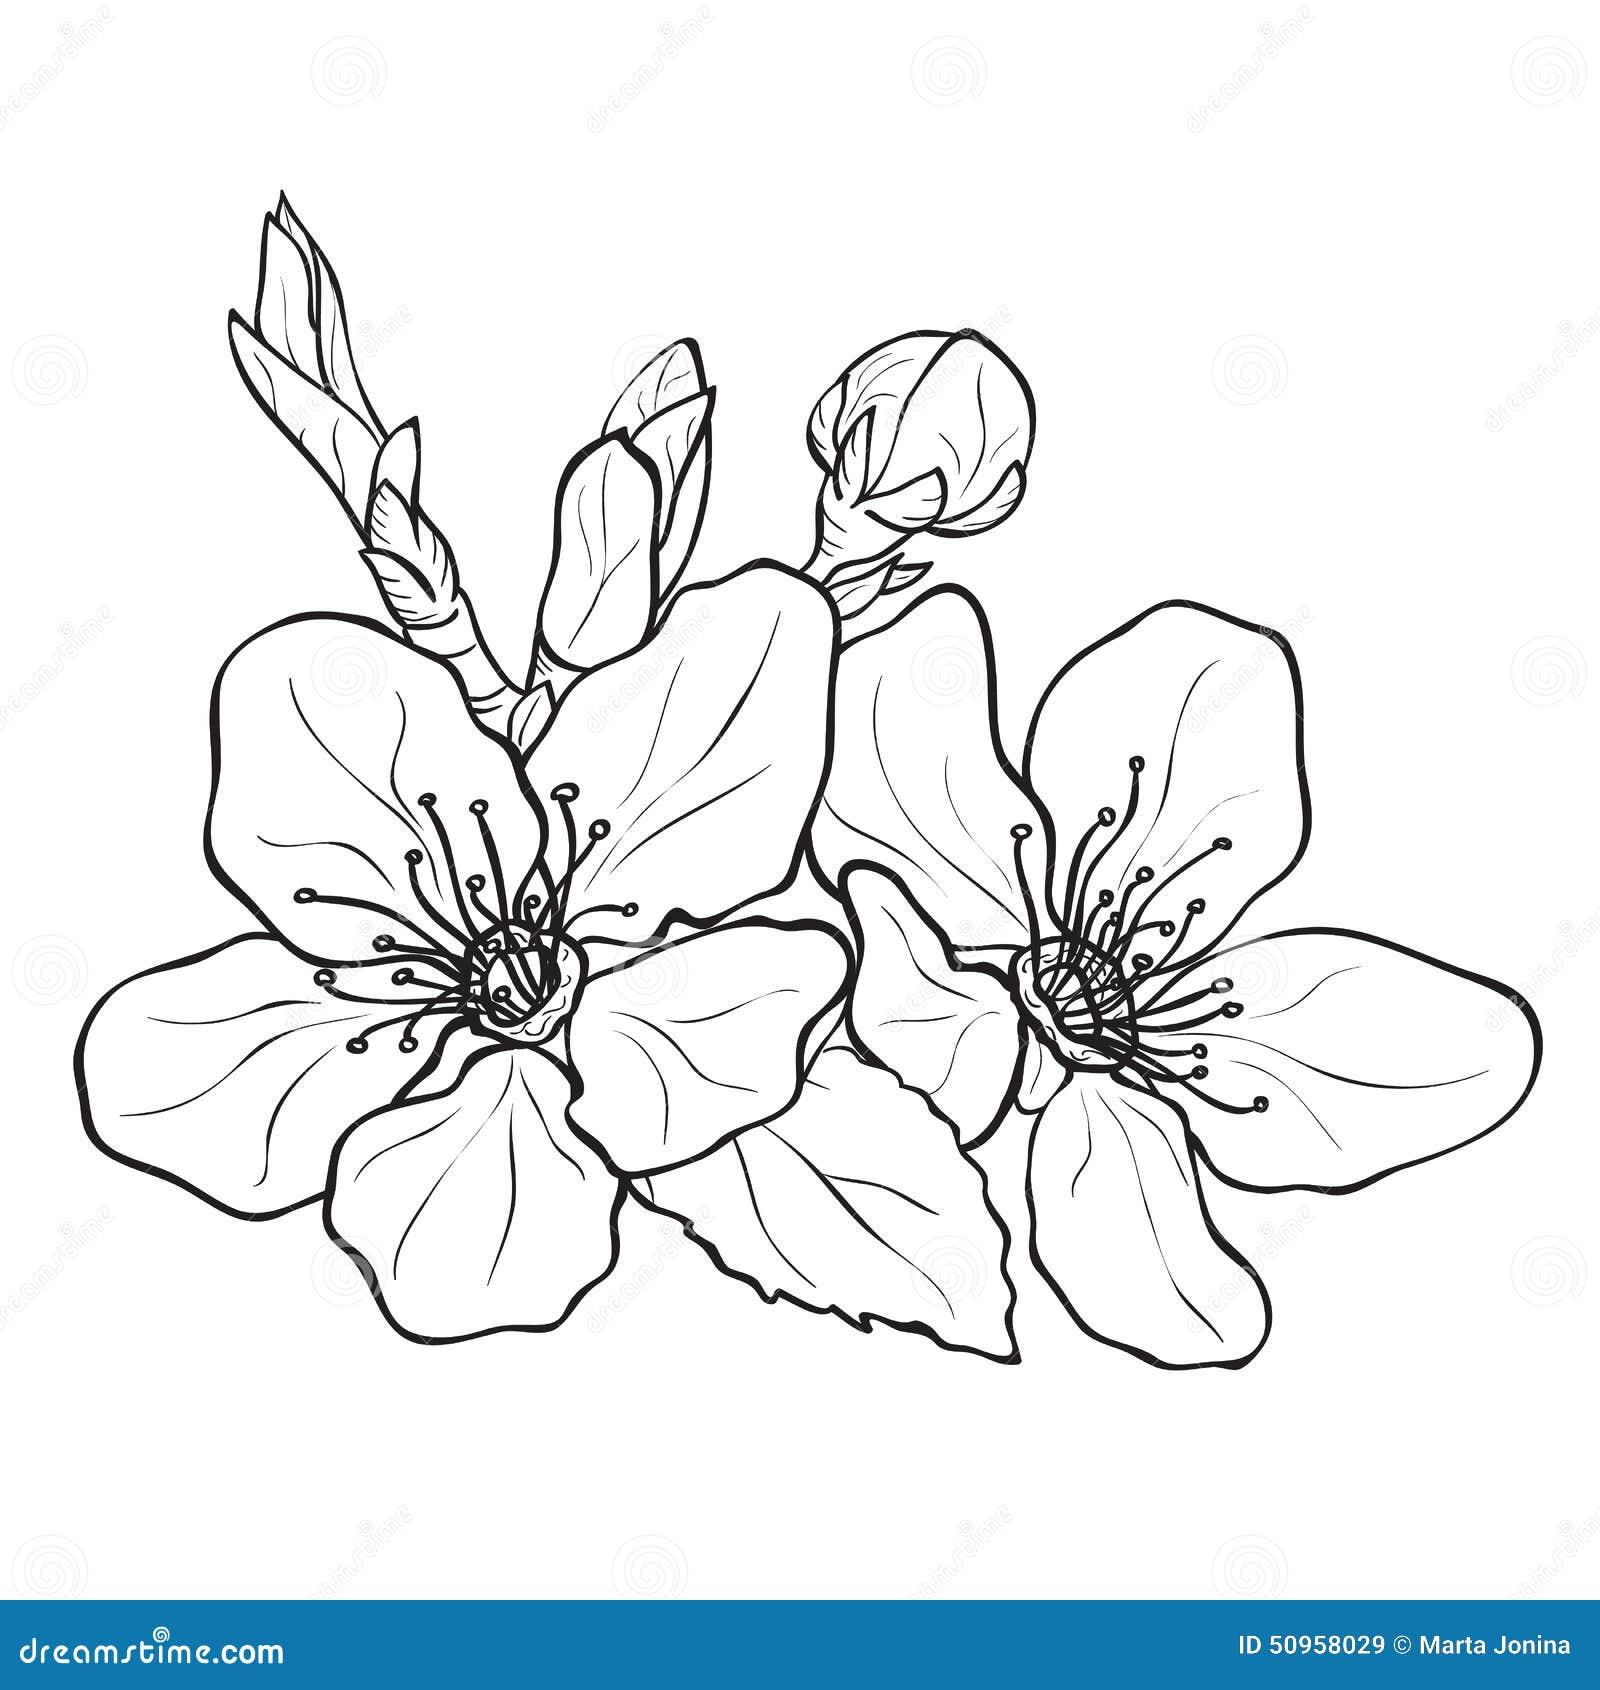 Fleur dessin de fleurs de cerisier illustration stock - Dessin fleur de cerisier ...